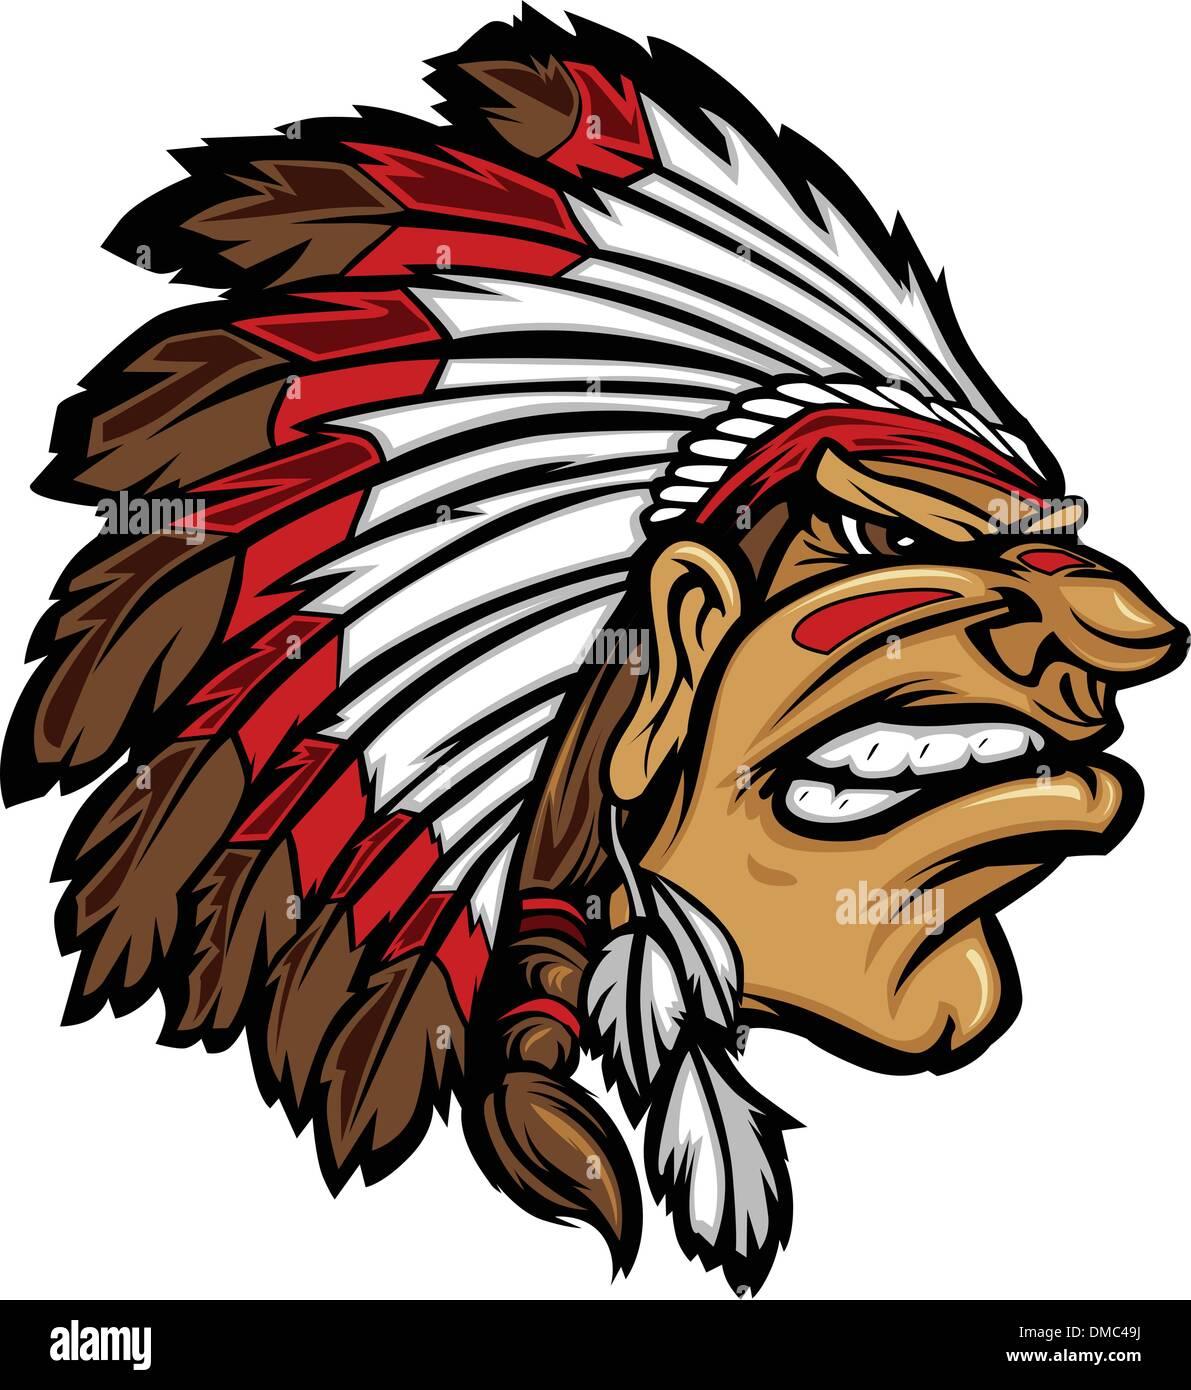 Indian Chief Mascot Head Cartoon Vector Graphic - Stock Image